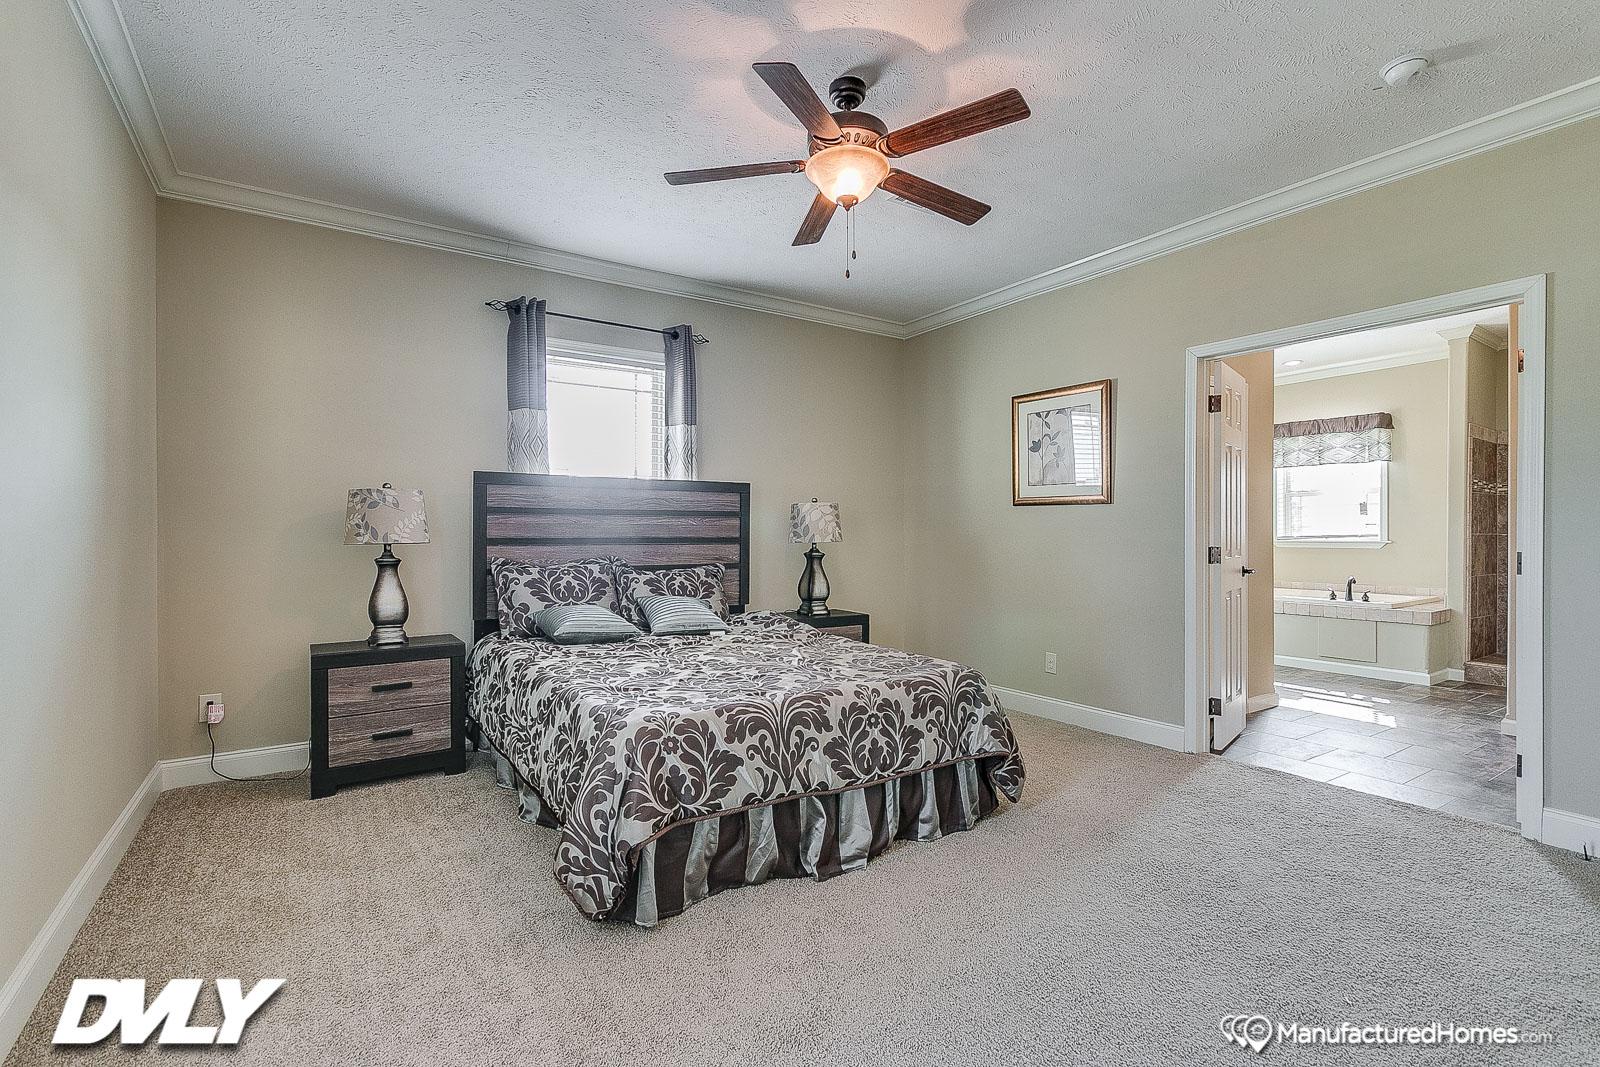 Sun Valley Series / Briarritz SVM-7204 - Bedroom